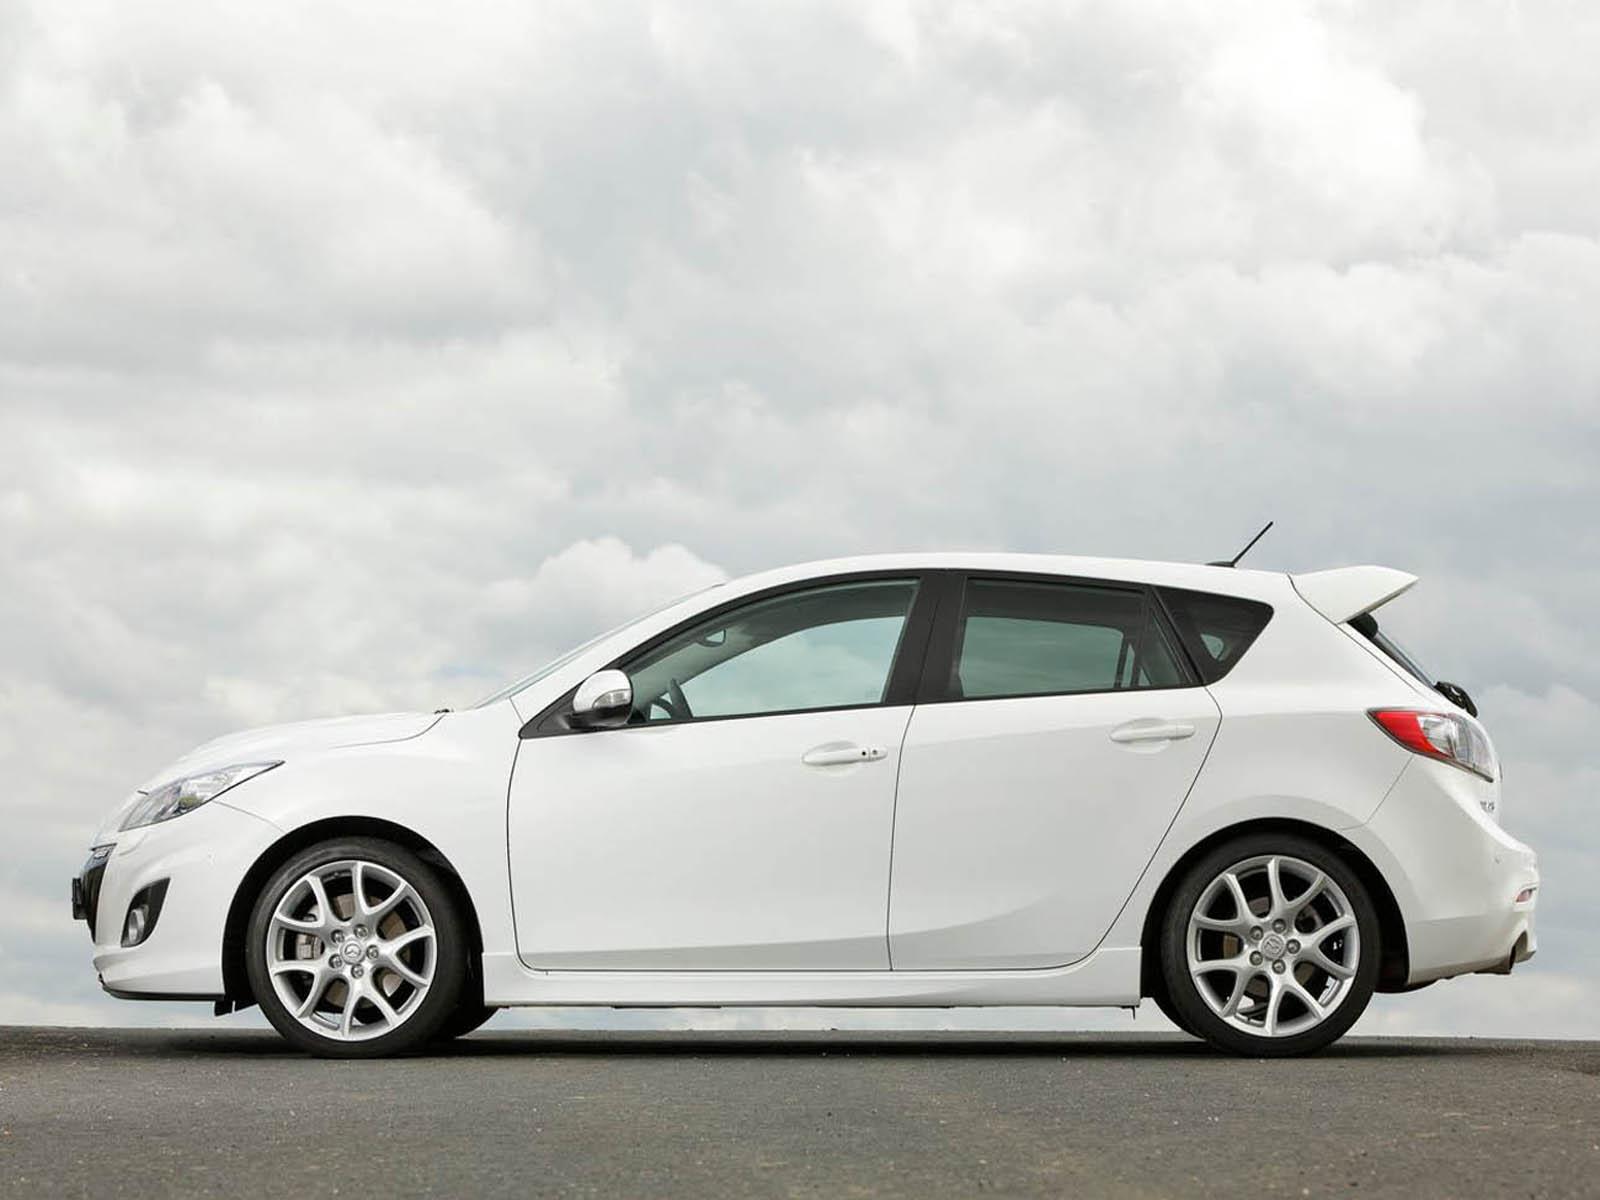 White Car HD Wallpapers 03602 Baltana